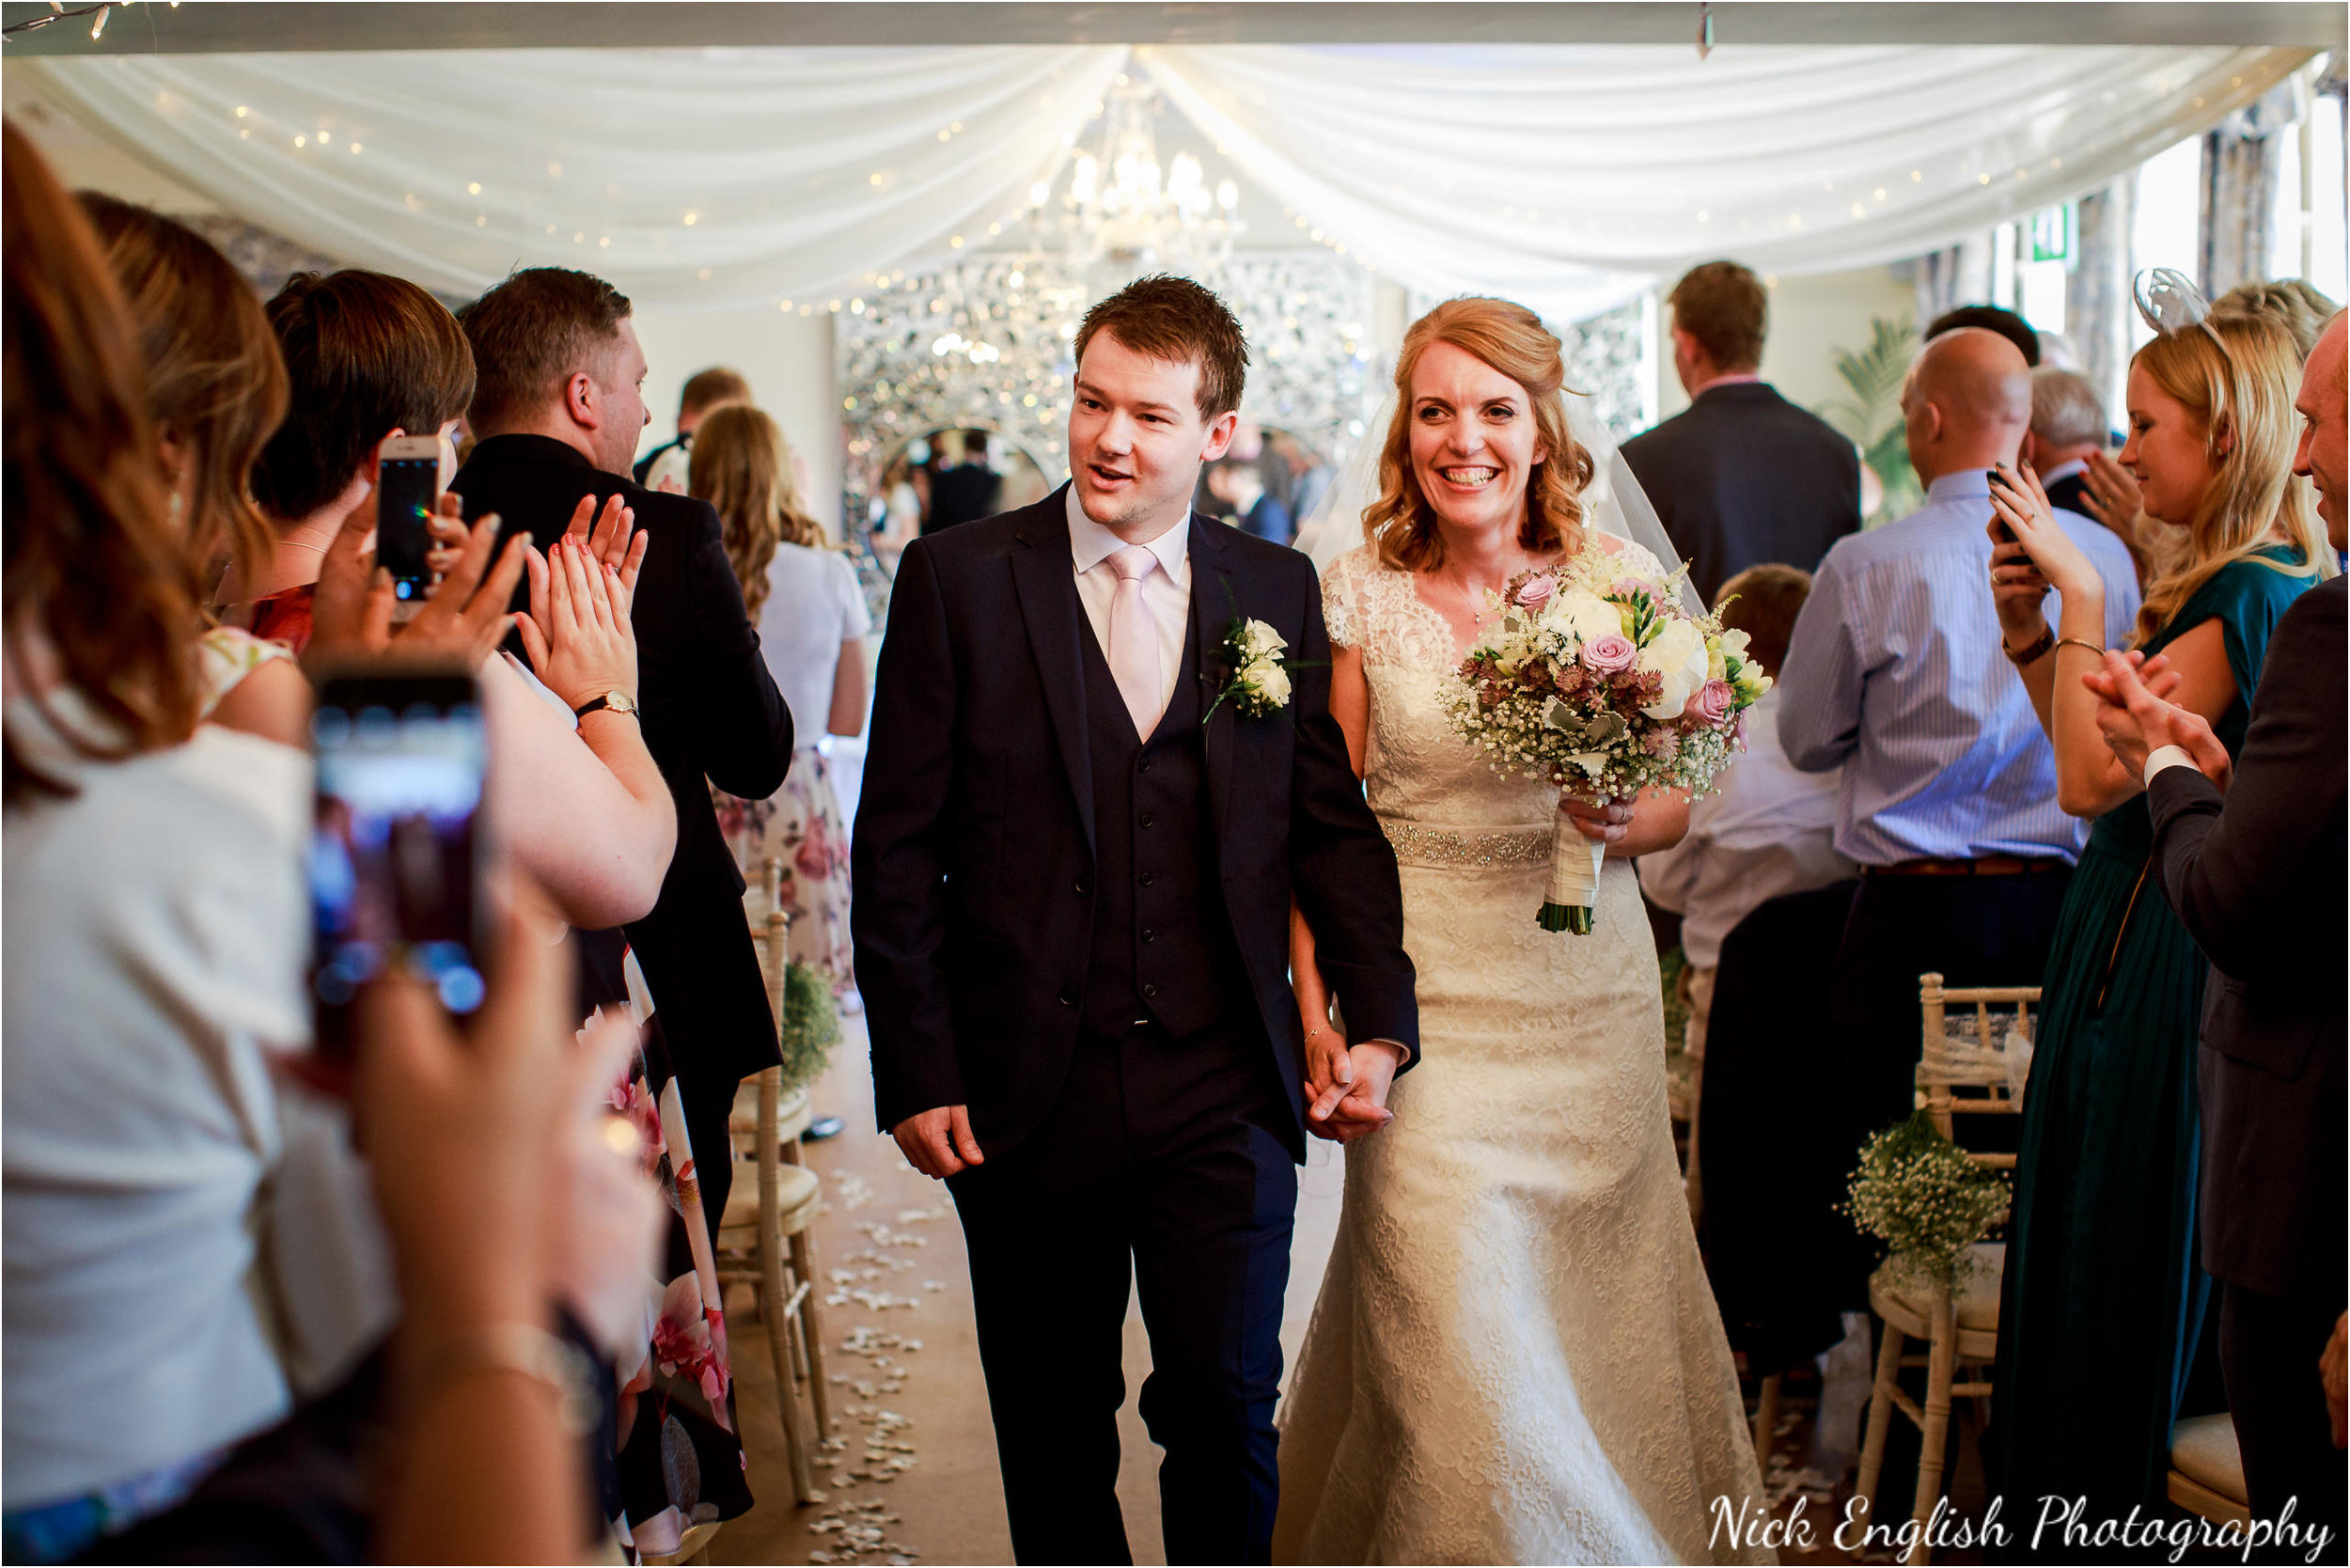 Alison James Wedding Photographs at Eaves Hall West Bradford 110jpg.jpeg